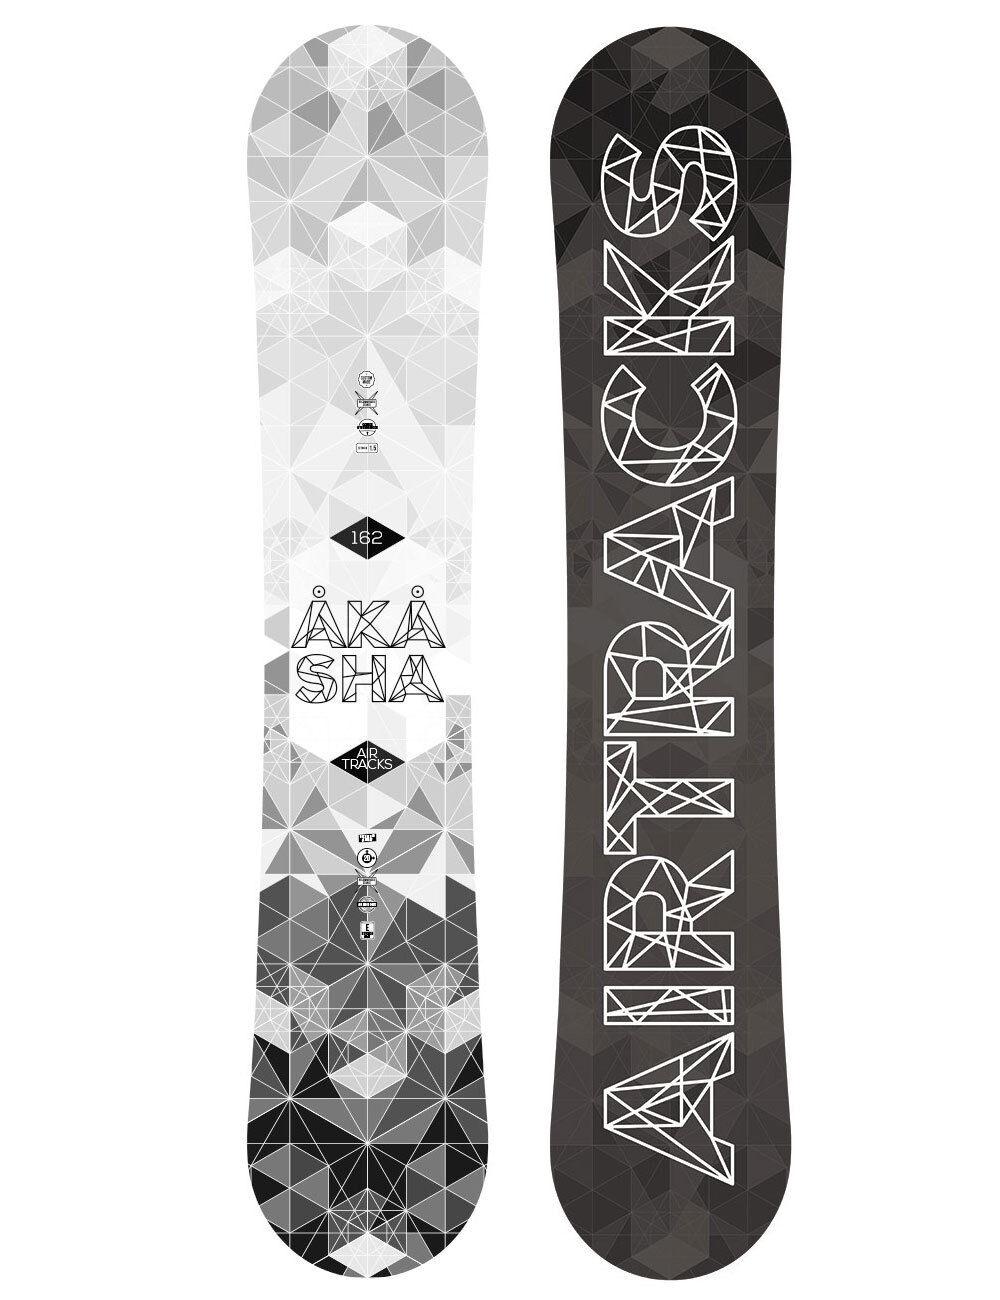 Set de Snowboard Airtracks Akasha Large Large Akasha + Fixation Étoile + Bottes + Sb Sac 152 9993a6